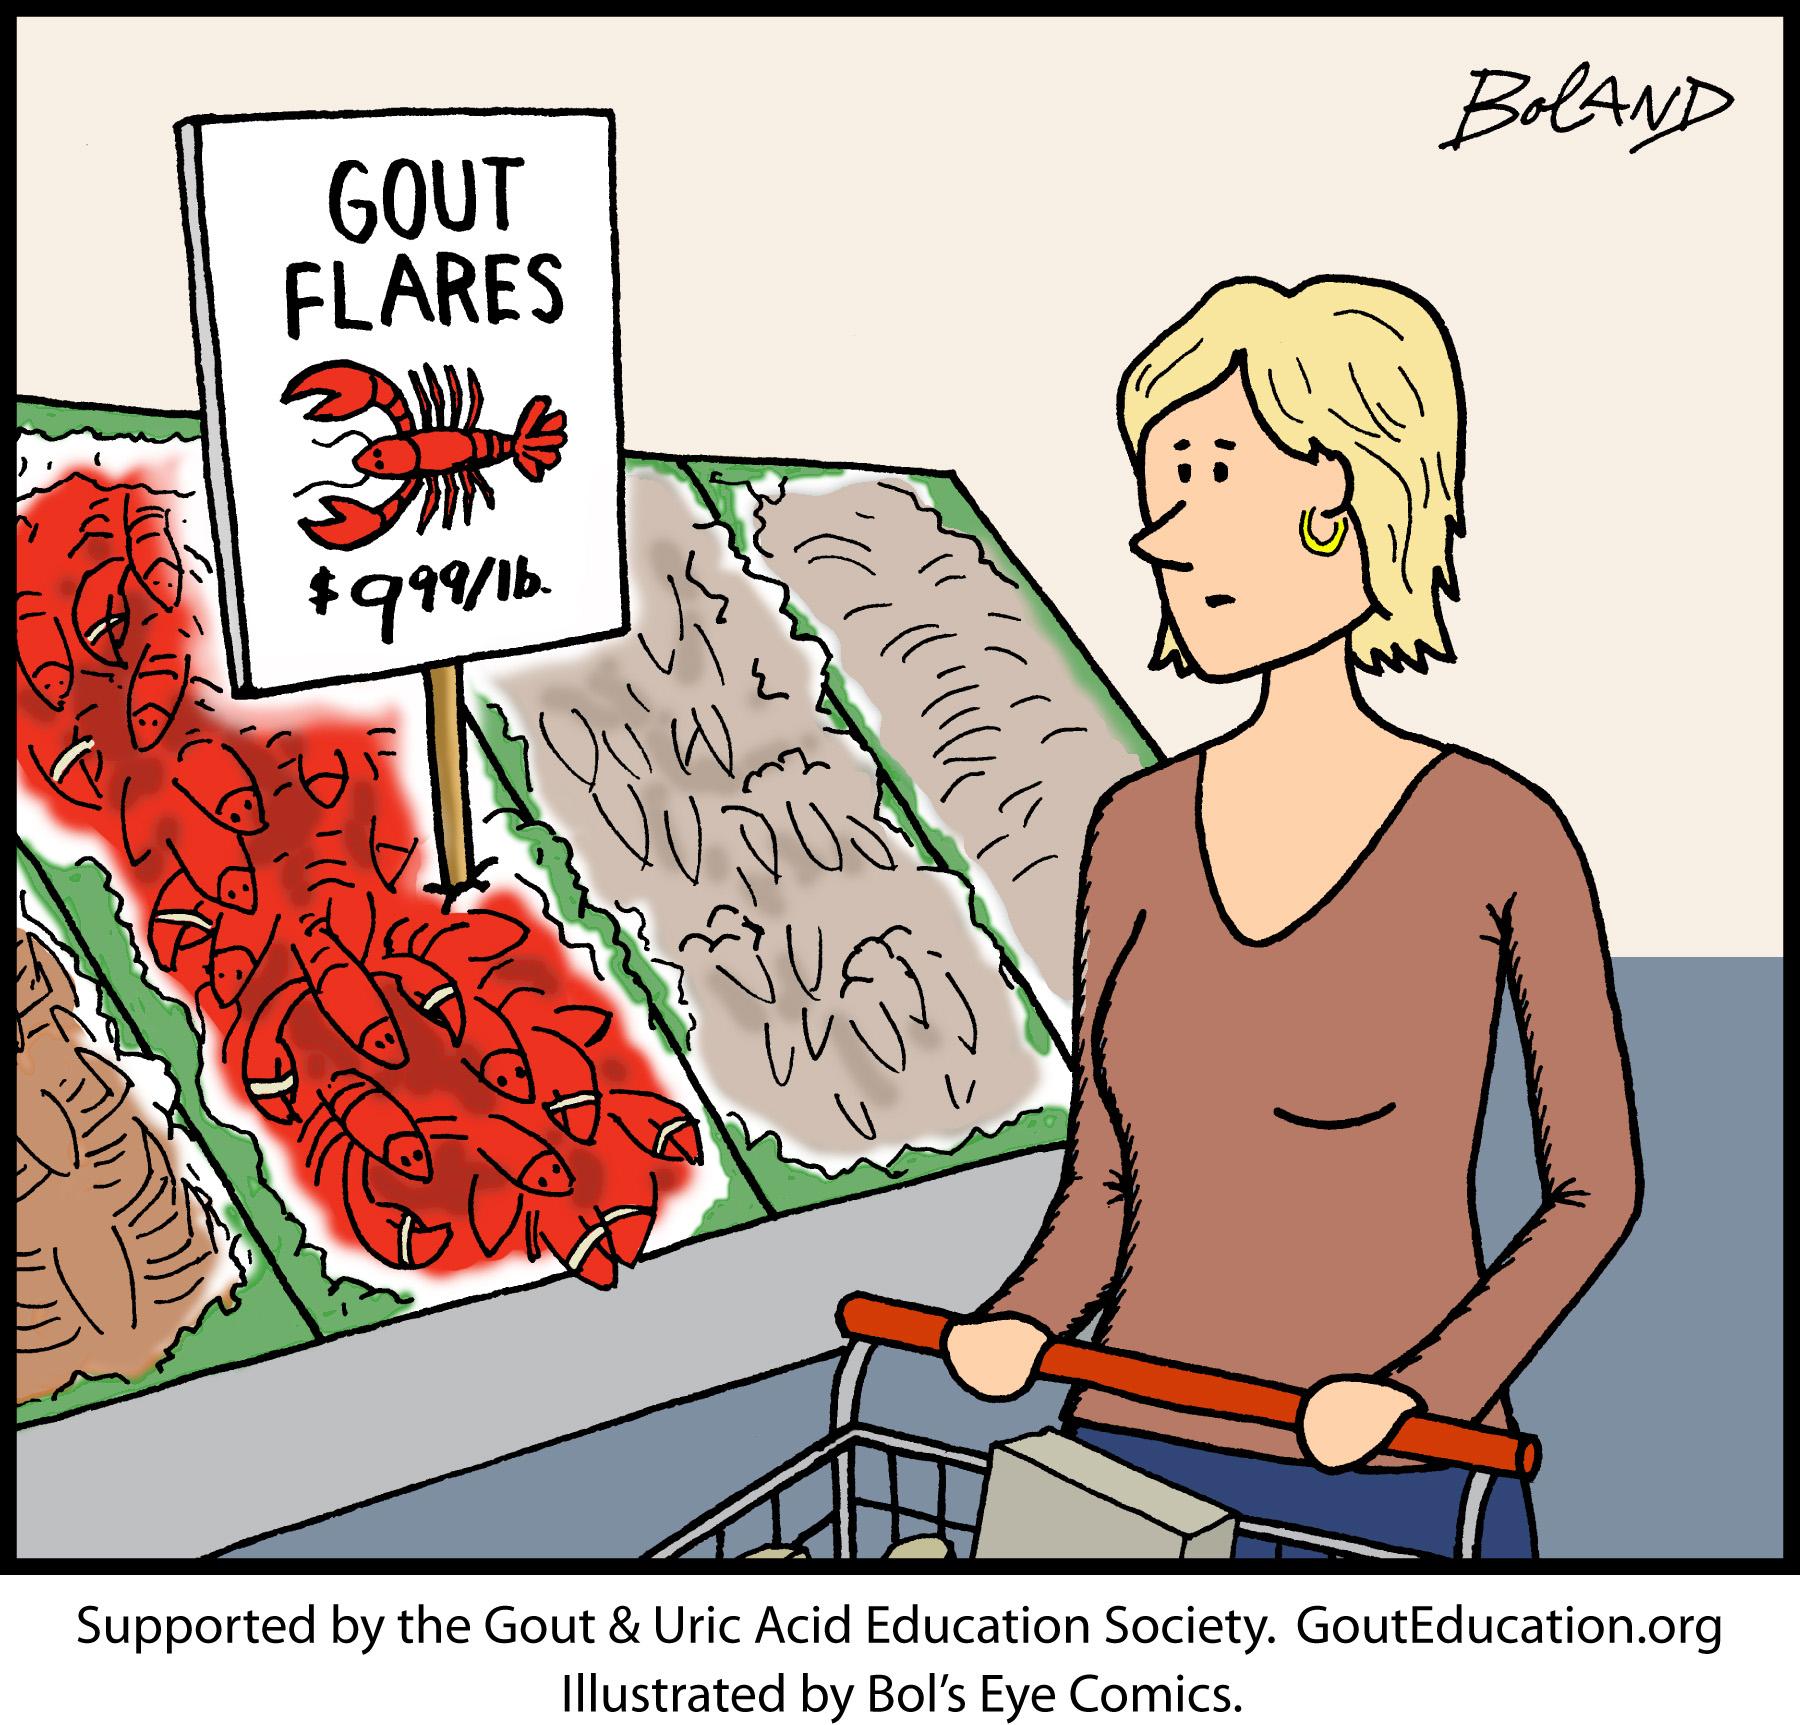 Gout Flares $9.99/lb